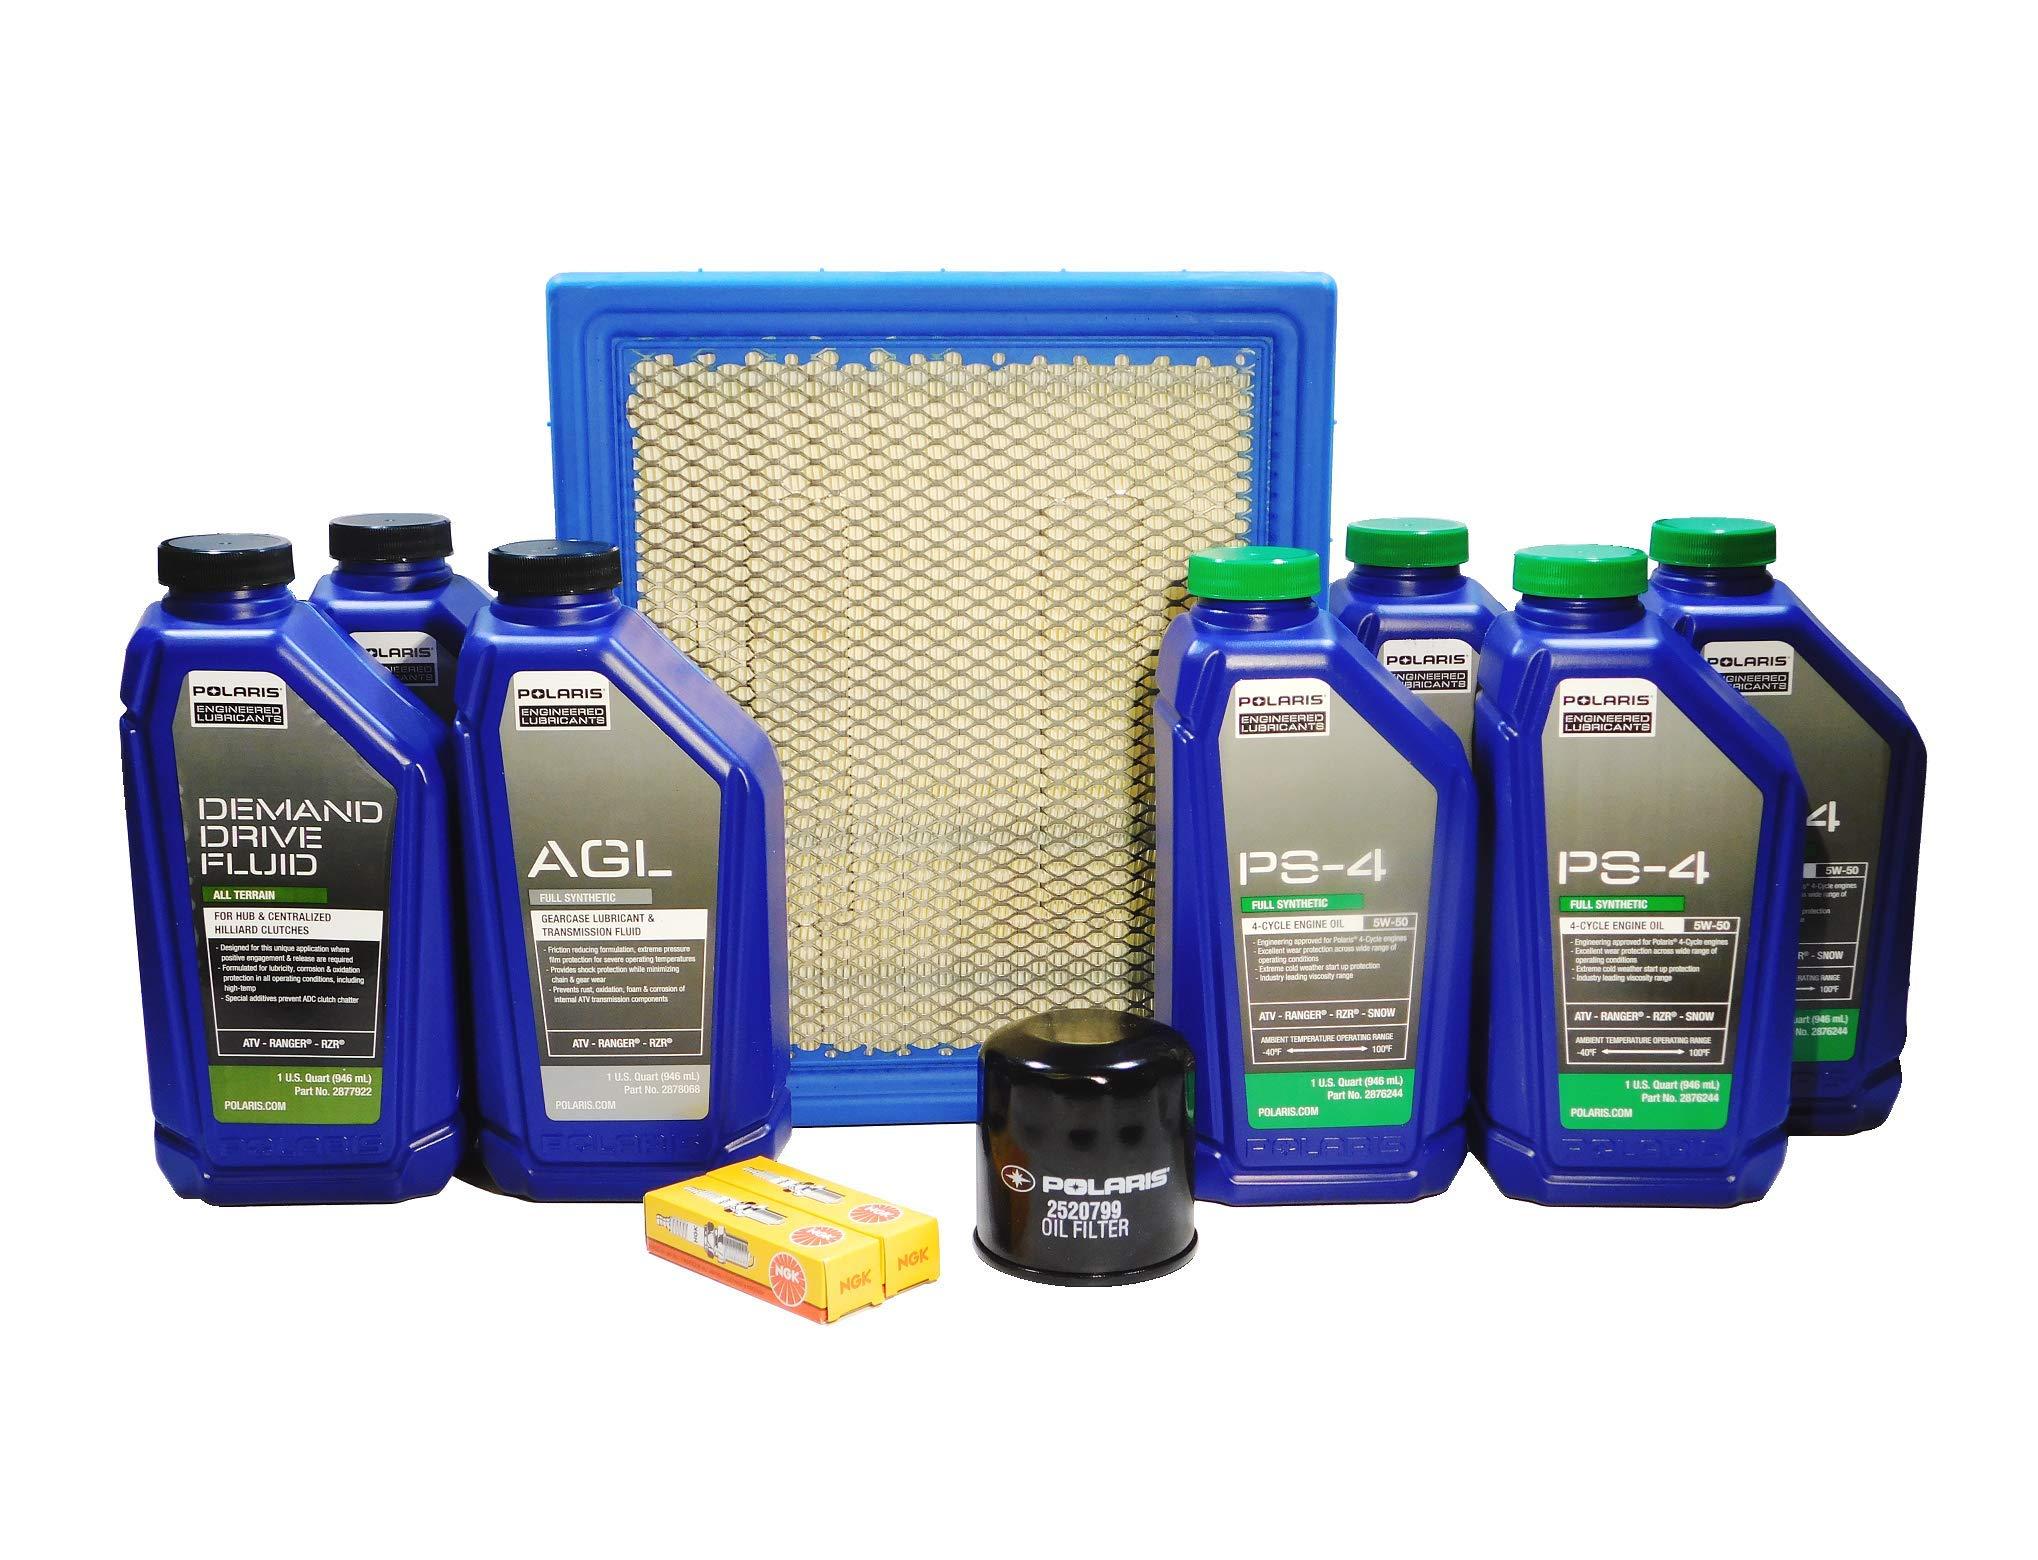 Polaris RZR XP900 RZR XP 900 OEM Complete Oil Change Service Kit POL01